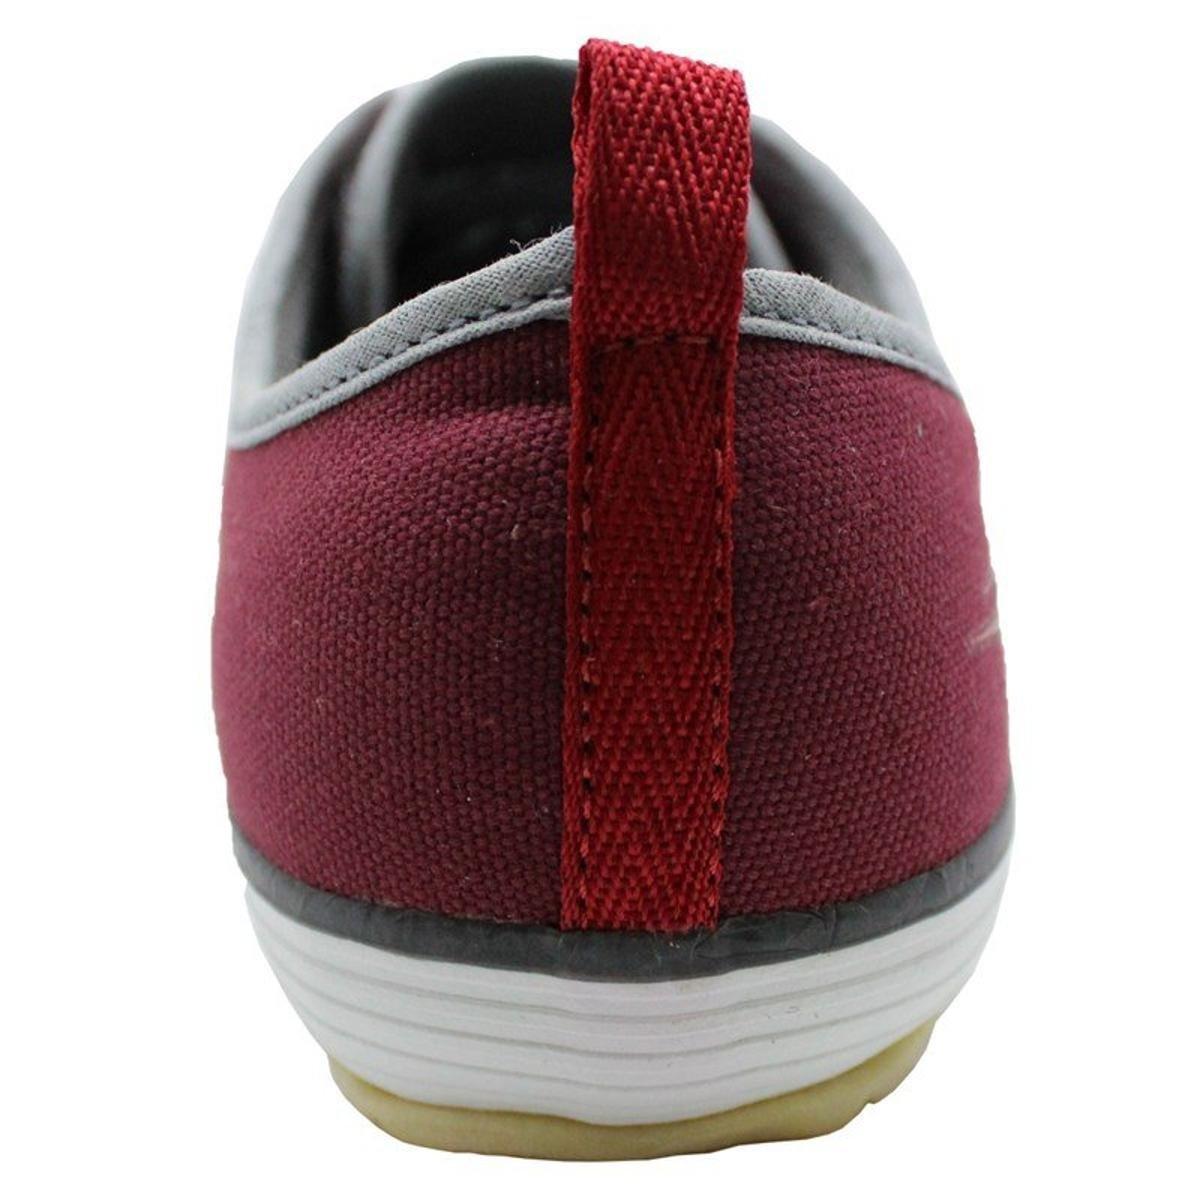 Chuteira Futsal Topper New Casual 4 Masculina - Bordô - Compre Agora ... 688b54cce39fb